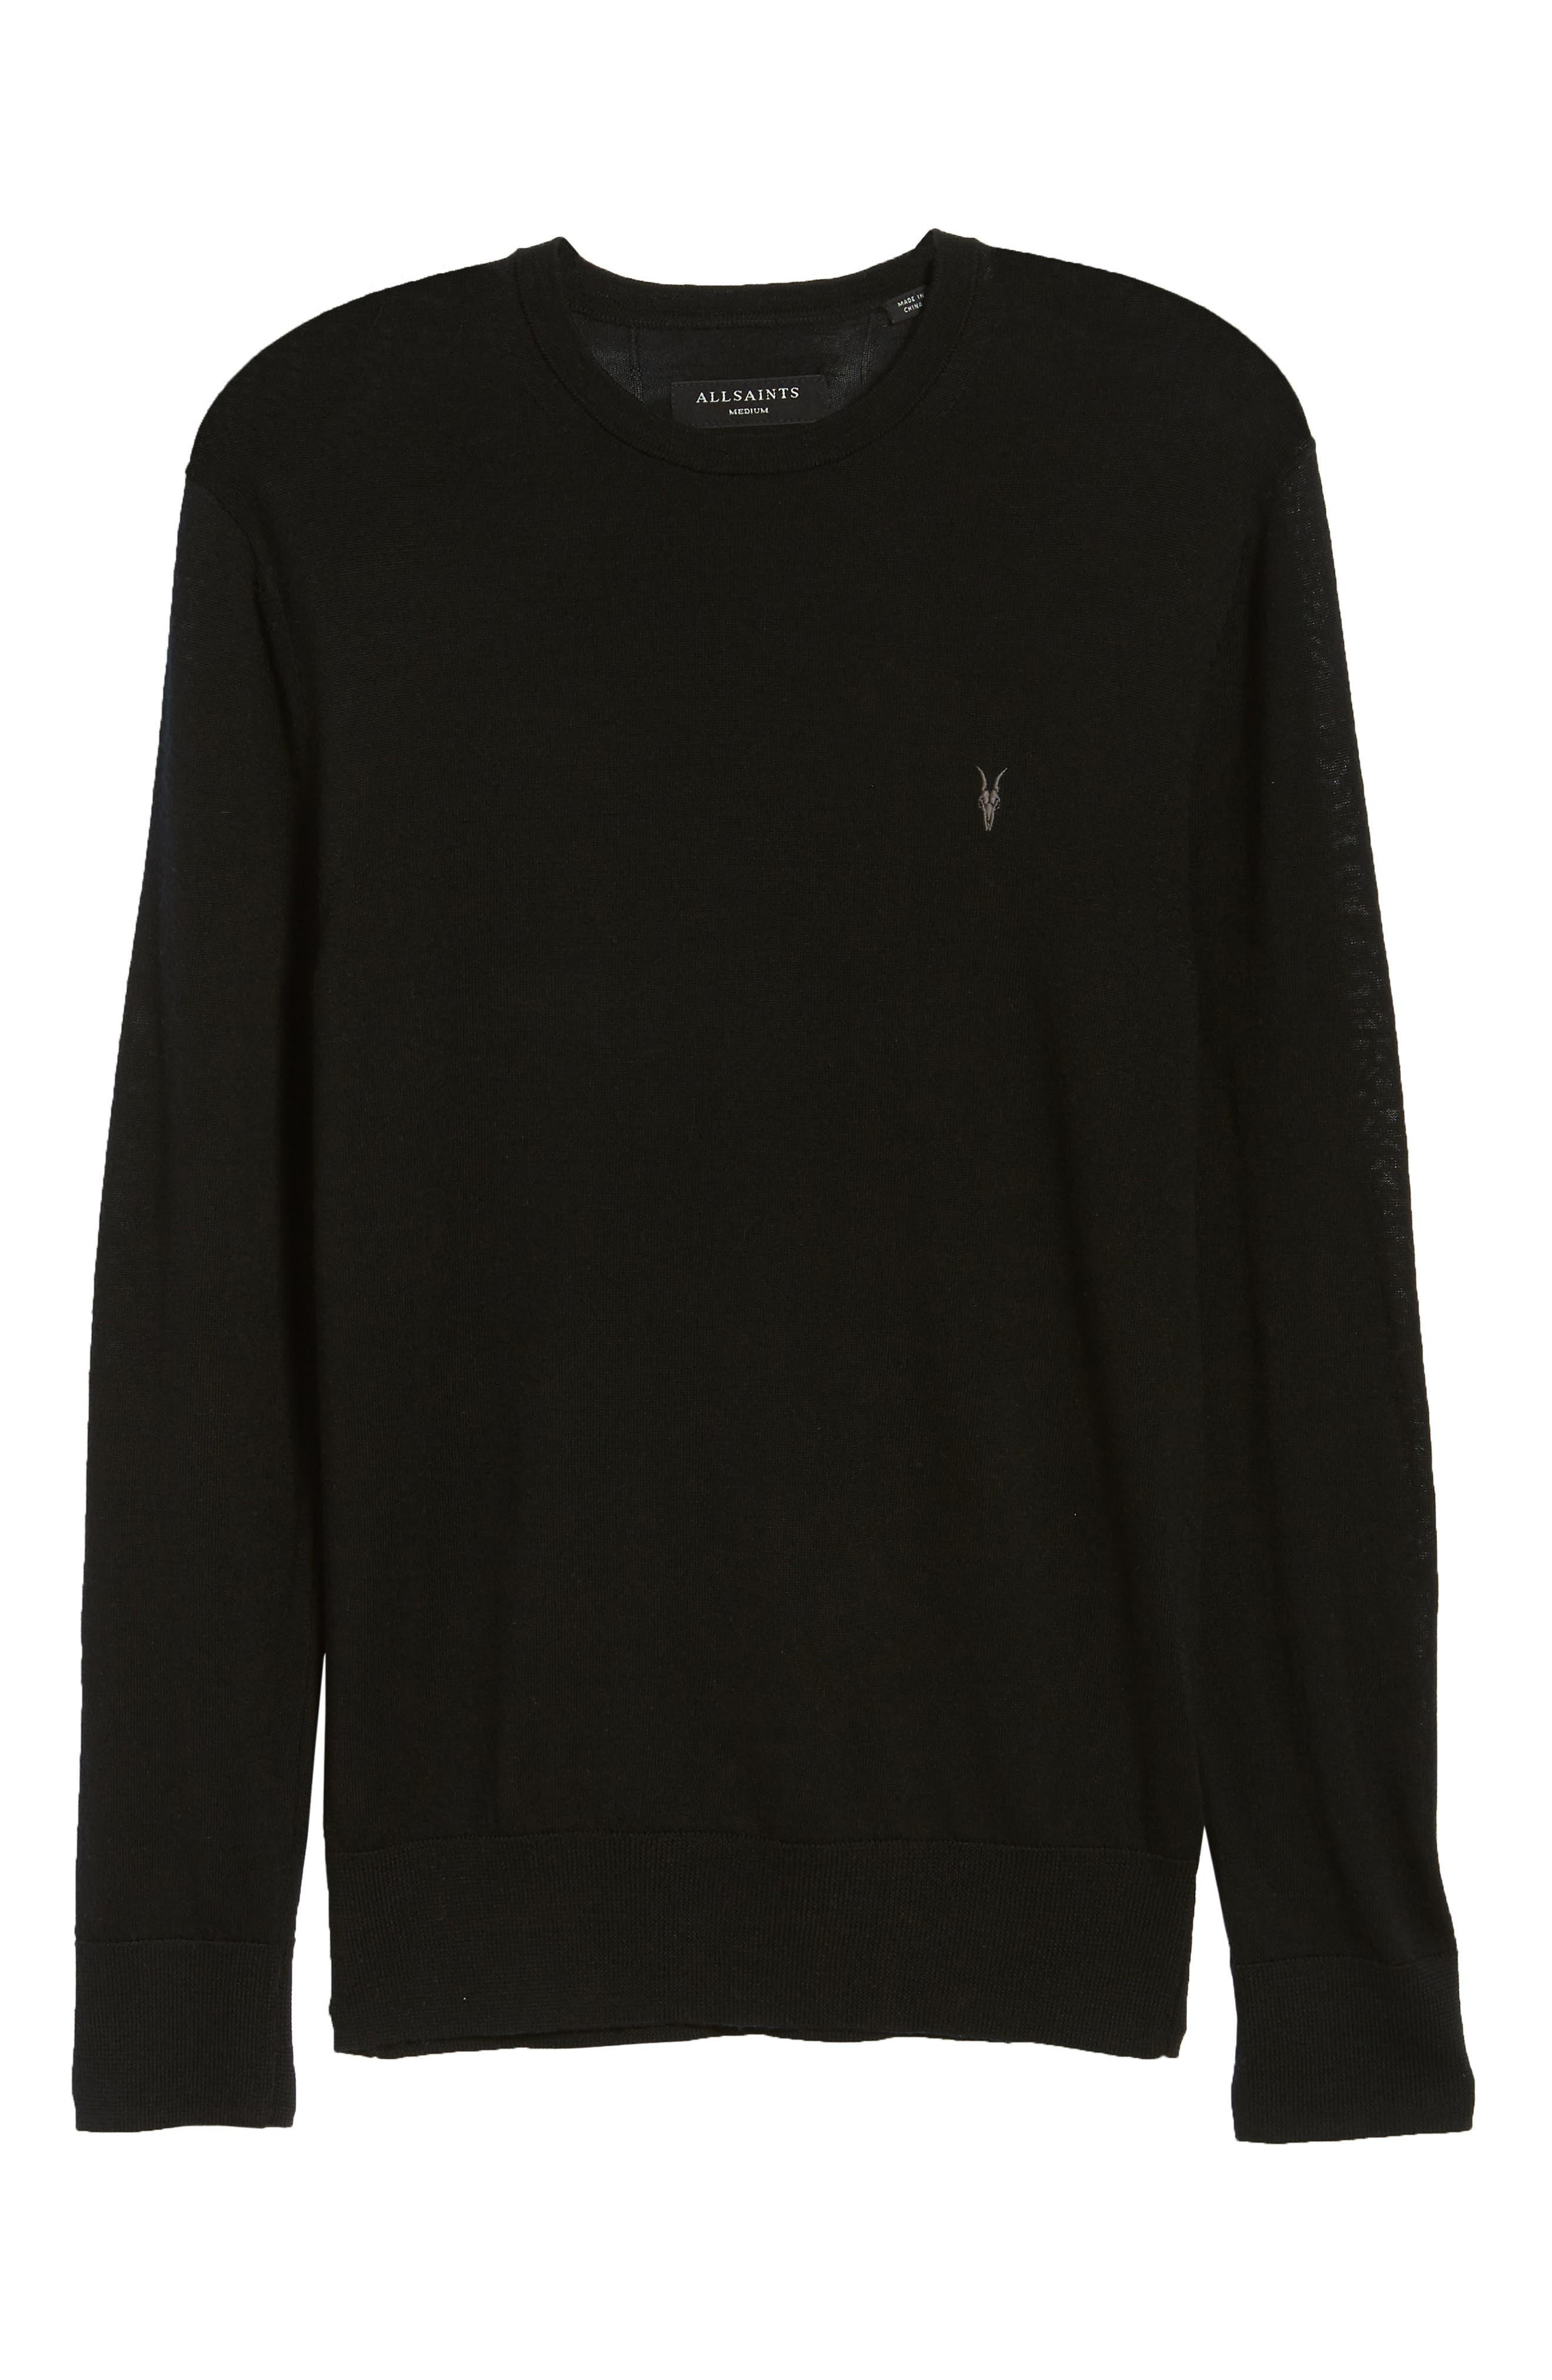 Mode Slim Fit Merino Wool Sweater,                             Alternate thumbnail 6, color,                             Black